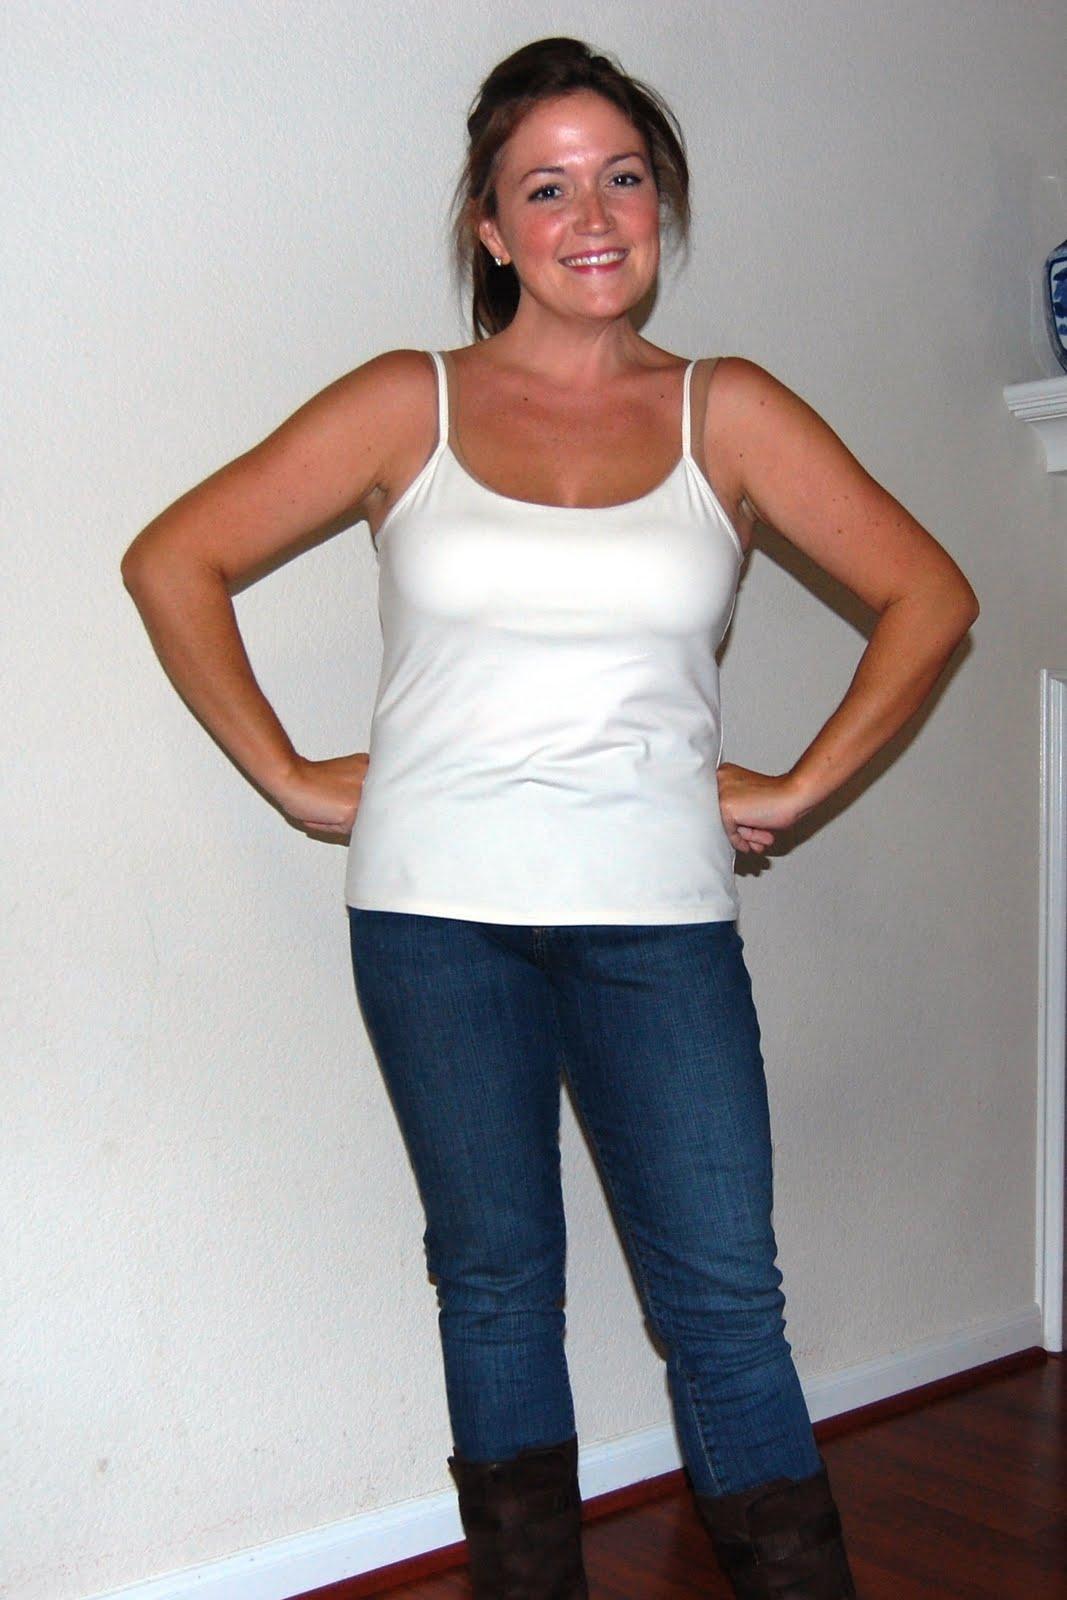 Chubby Mom Photos - Photo EROTIC